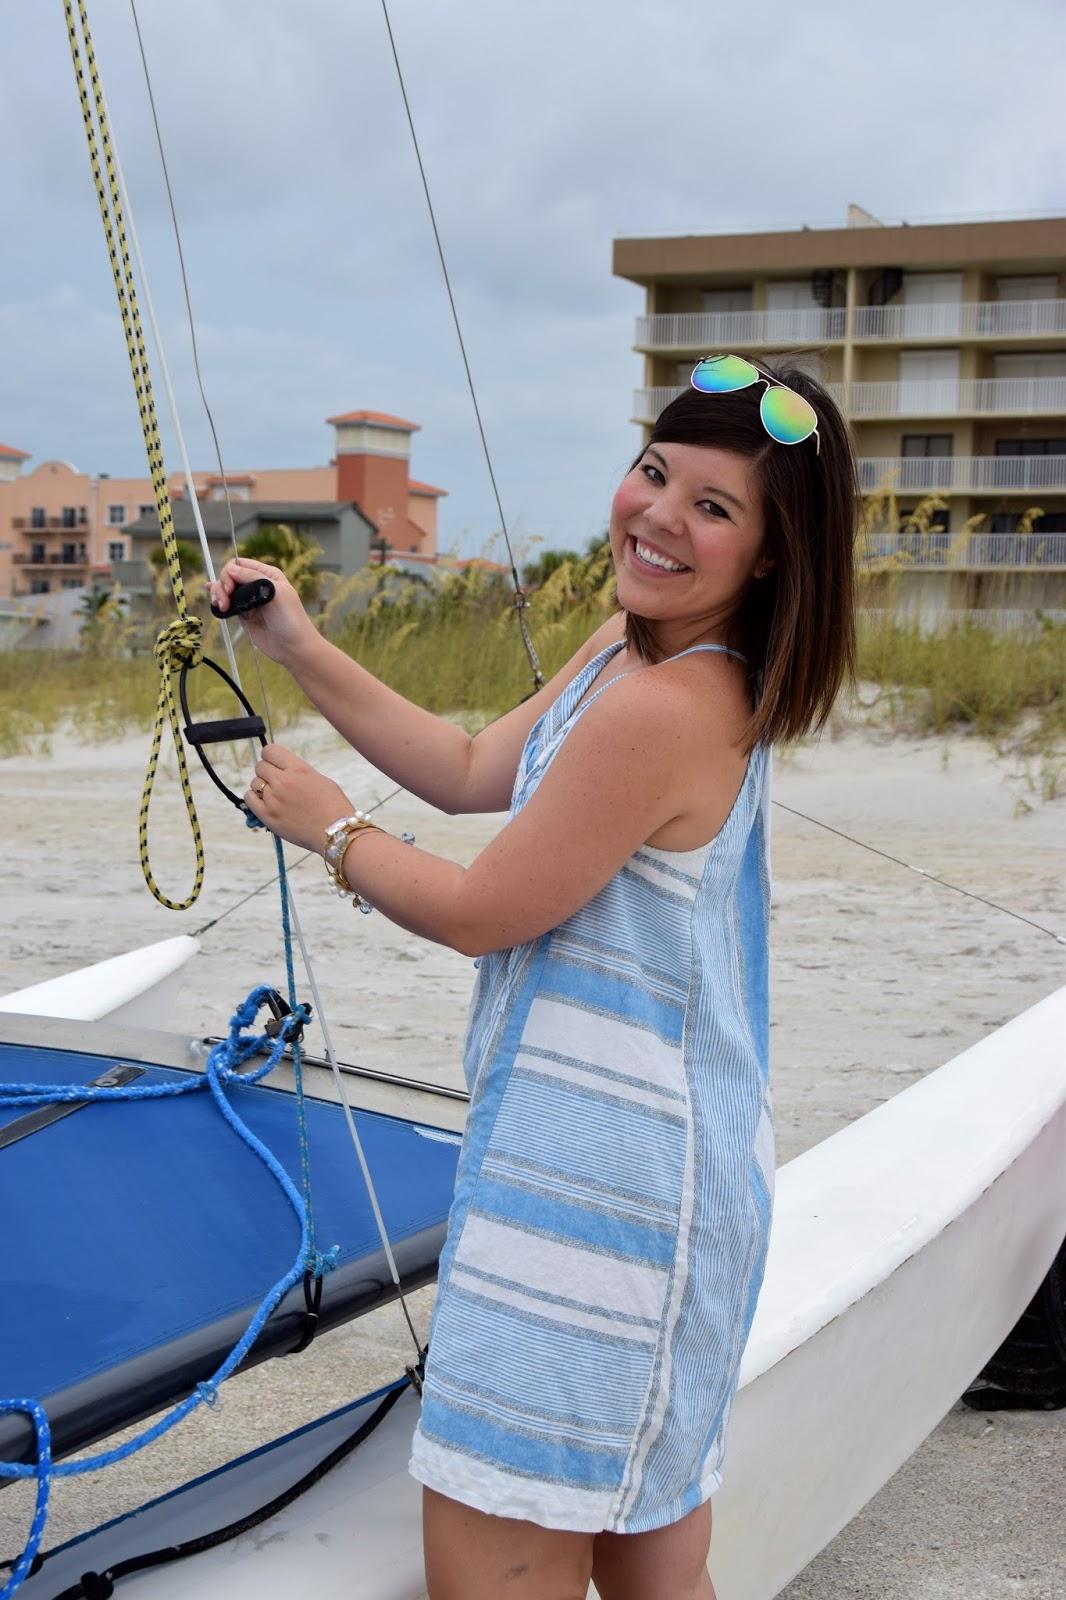 Boating Blues